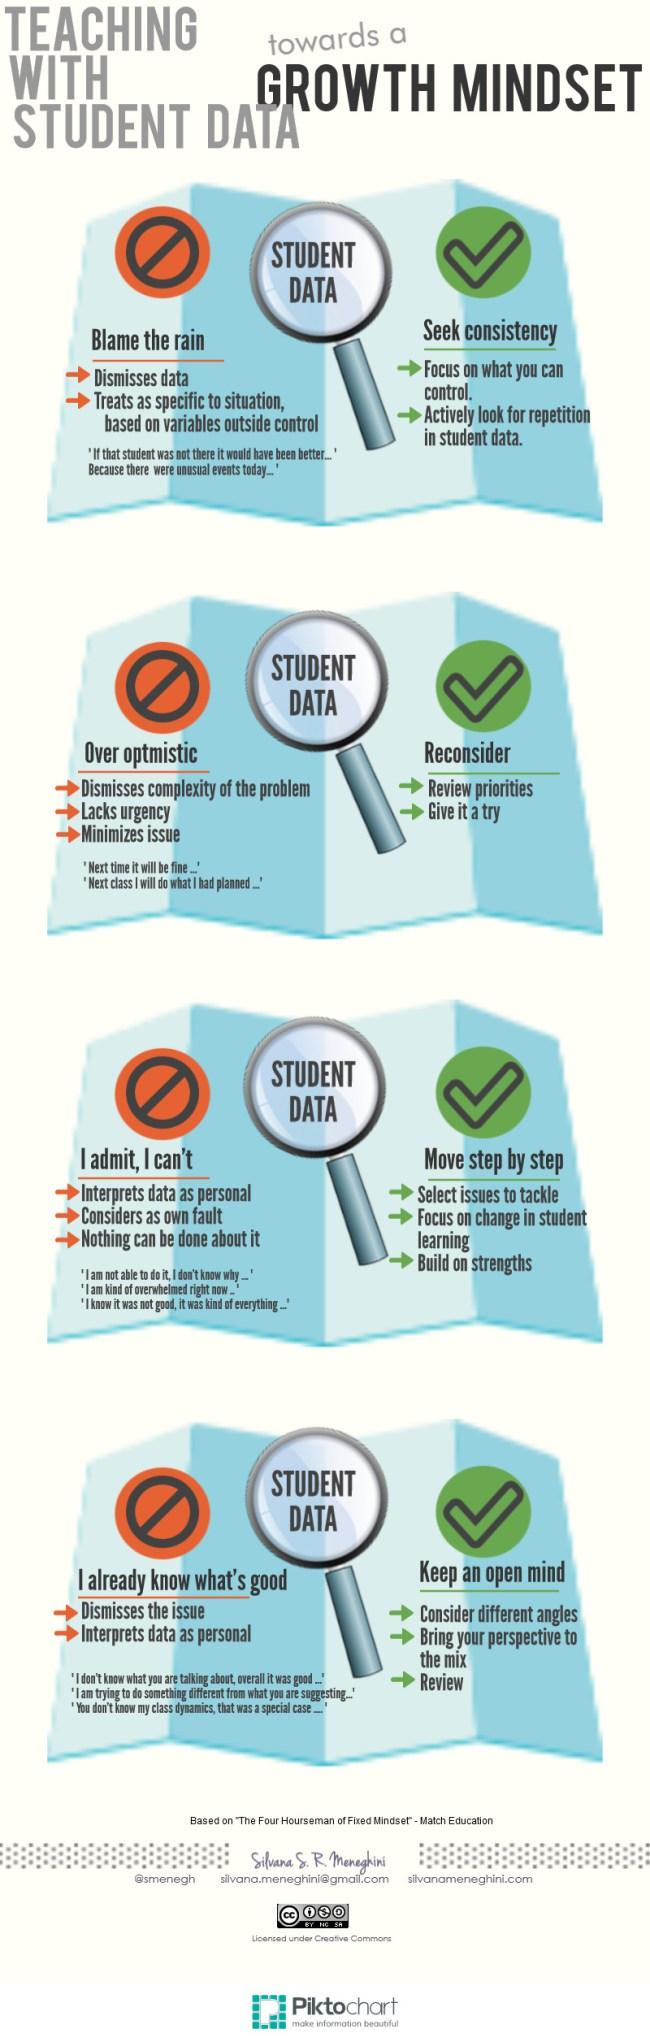 Teaching Based on Student Data - Growth Mindset